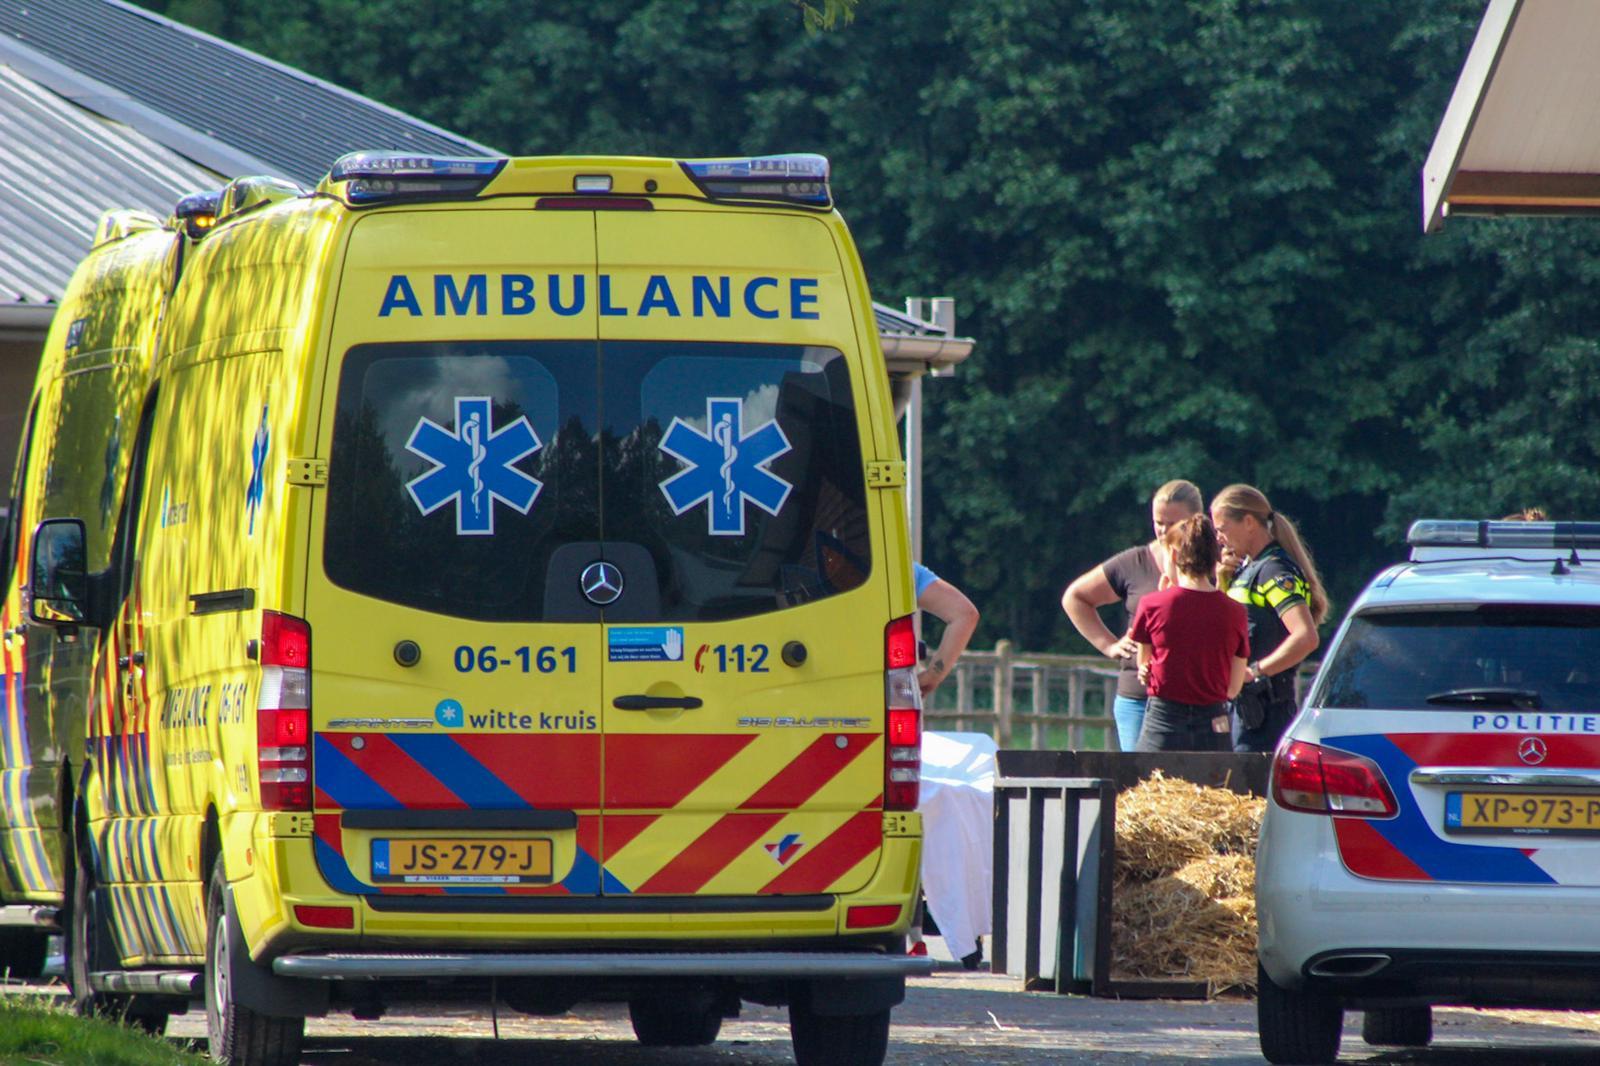 Slachtoffer ernstig gewond bij ongeval op manege in Vorden.